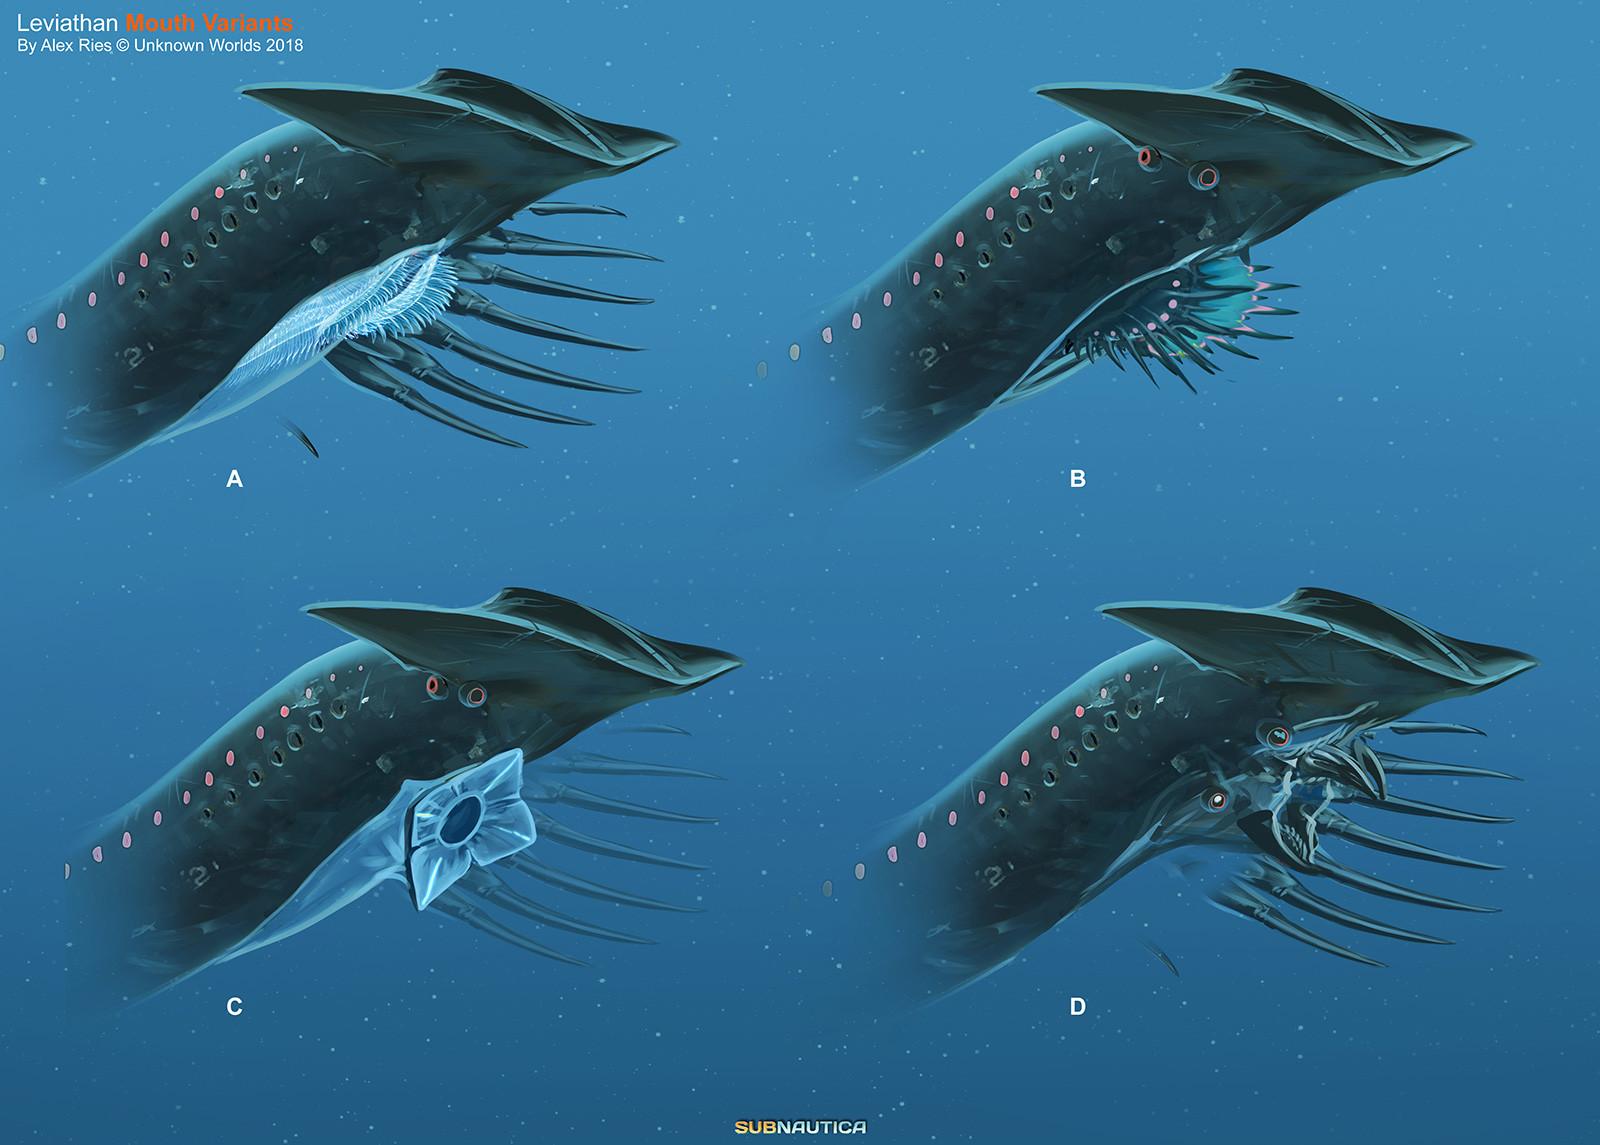 ArtStation - Shadow Leviathan, Alex Ries